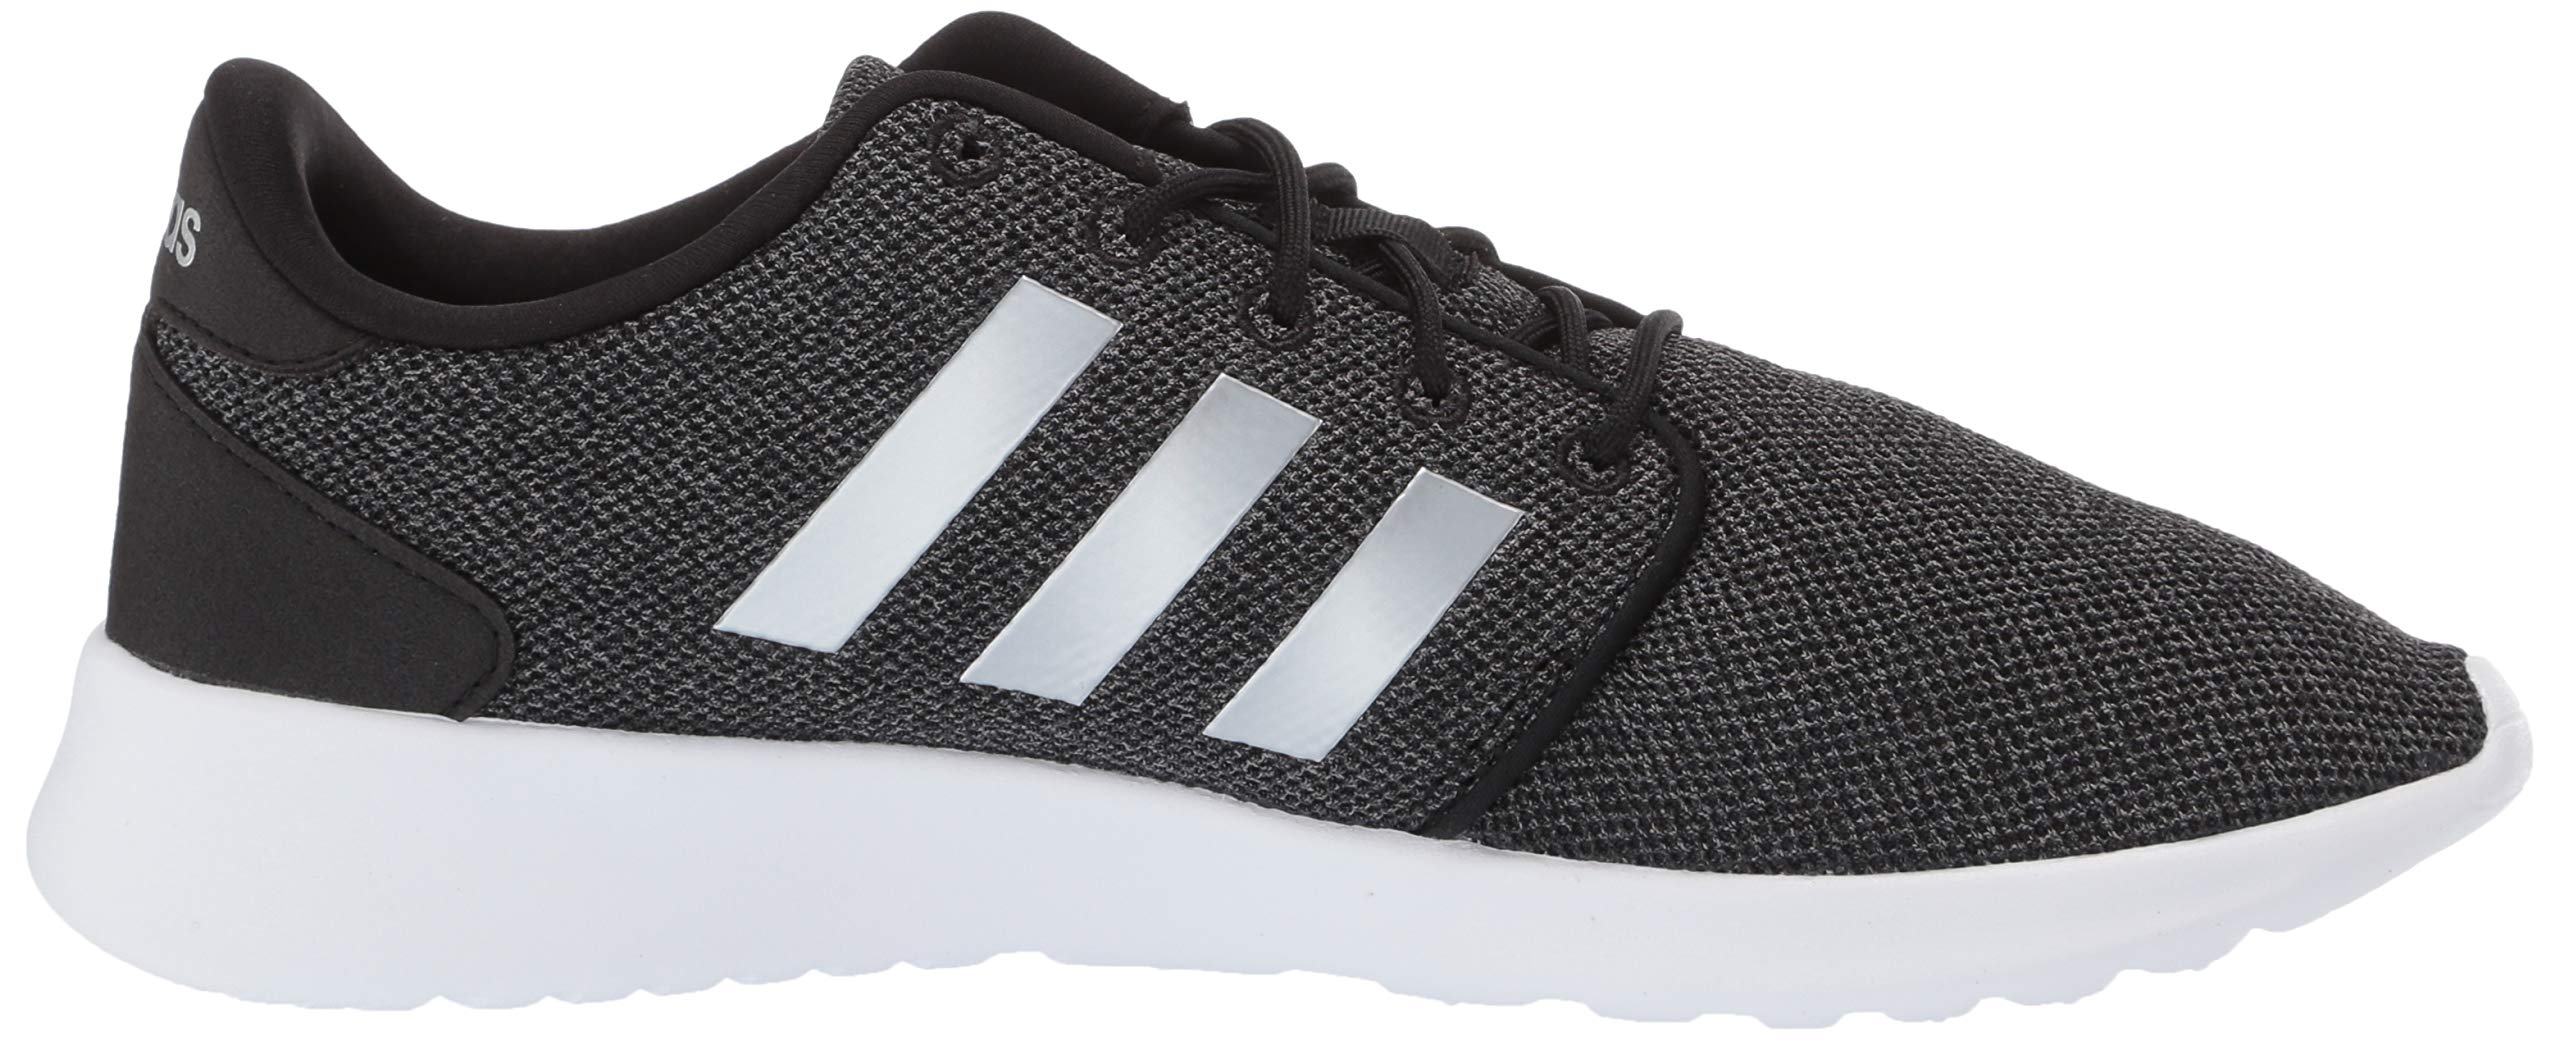 adidas Women's Cloudfoam Qt Racer Sneaker, Black/Silver Metallic/Grey, 5.5 M US by adidas (Image #6)